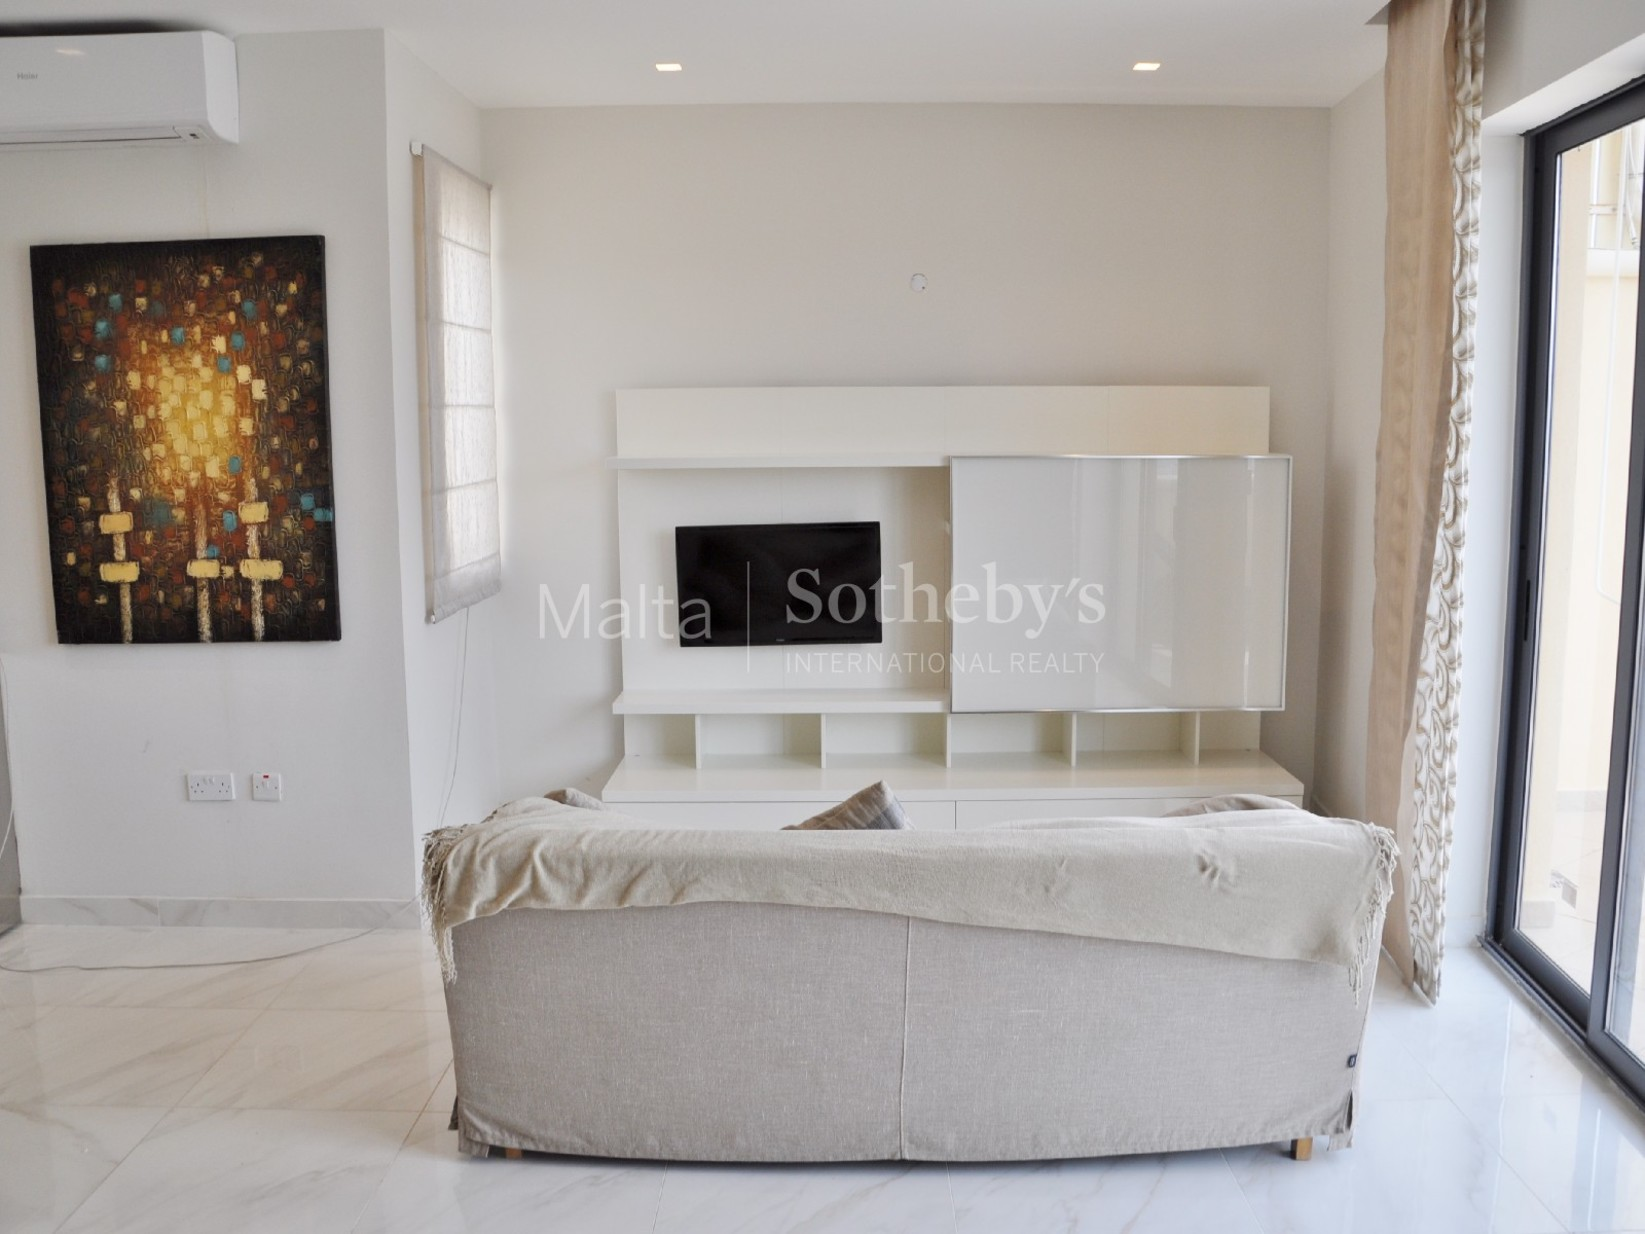 2 bed Penthouse For Rent in Xemxija, Xemxija - thumb 7